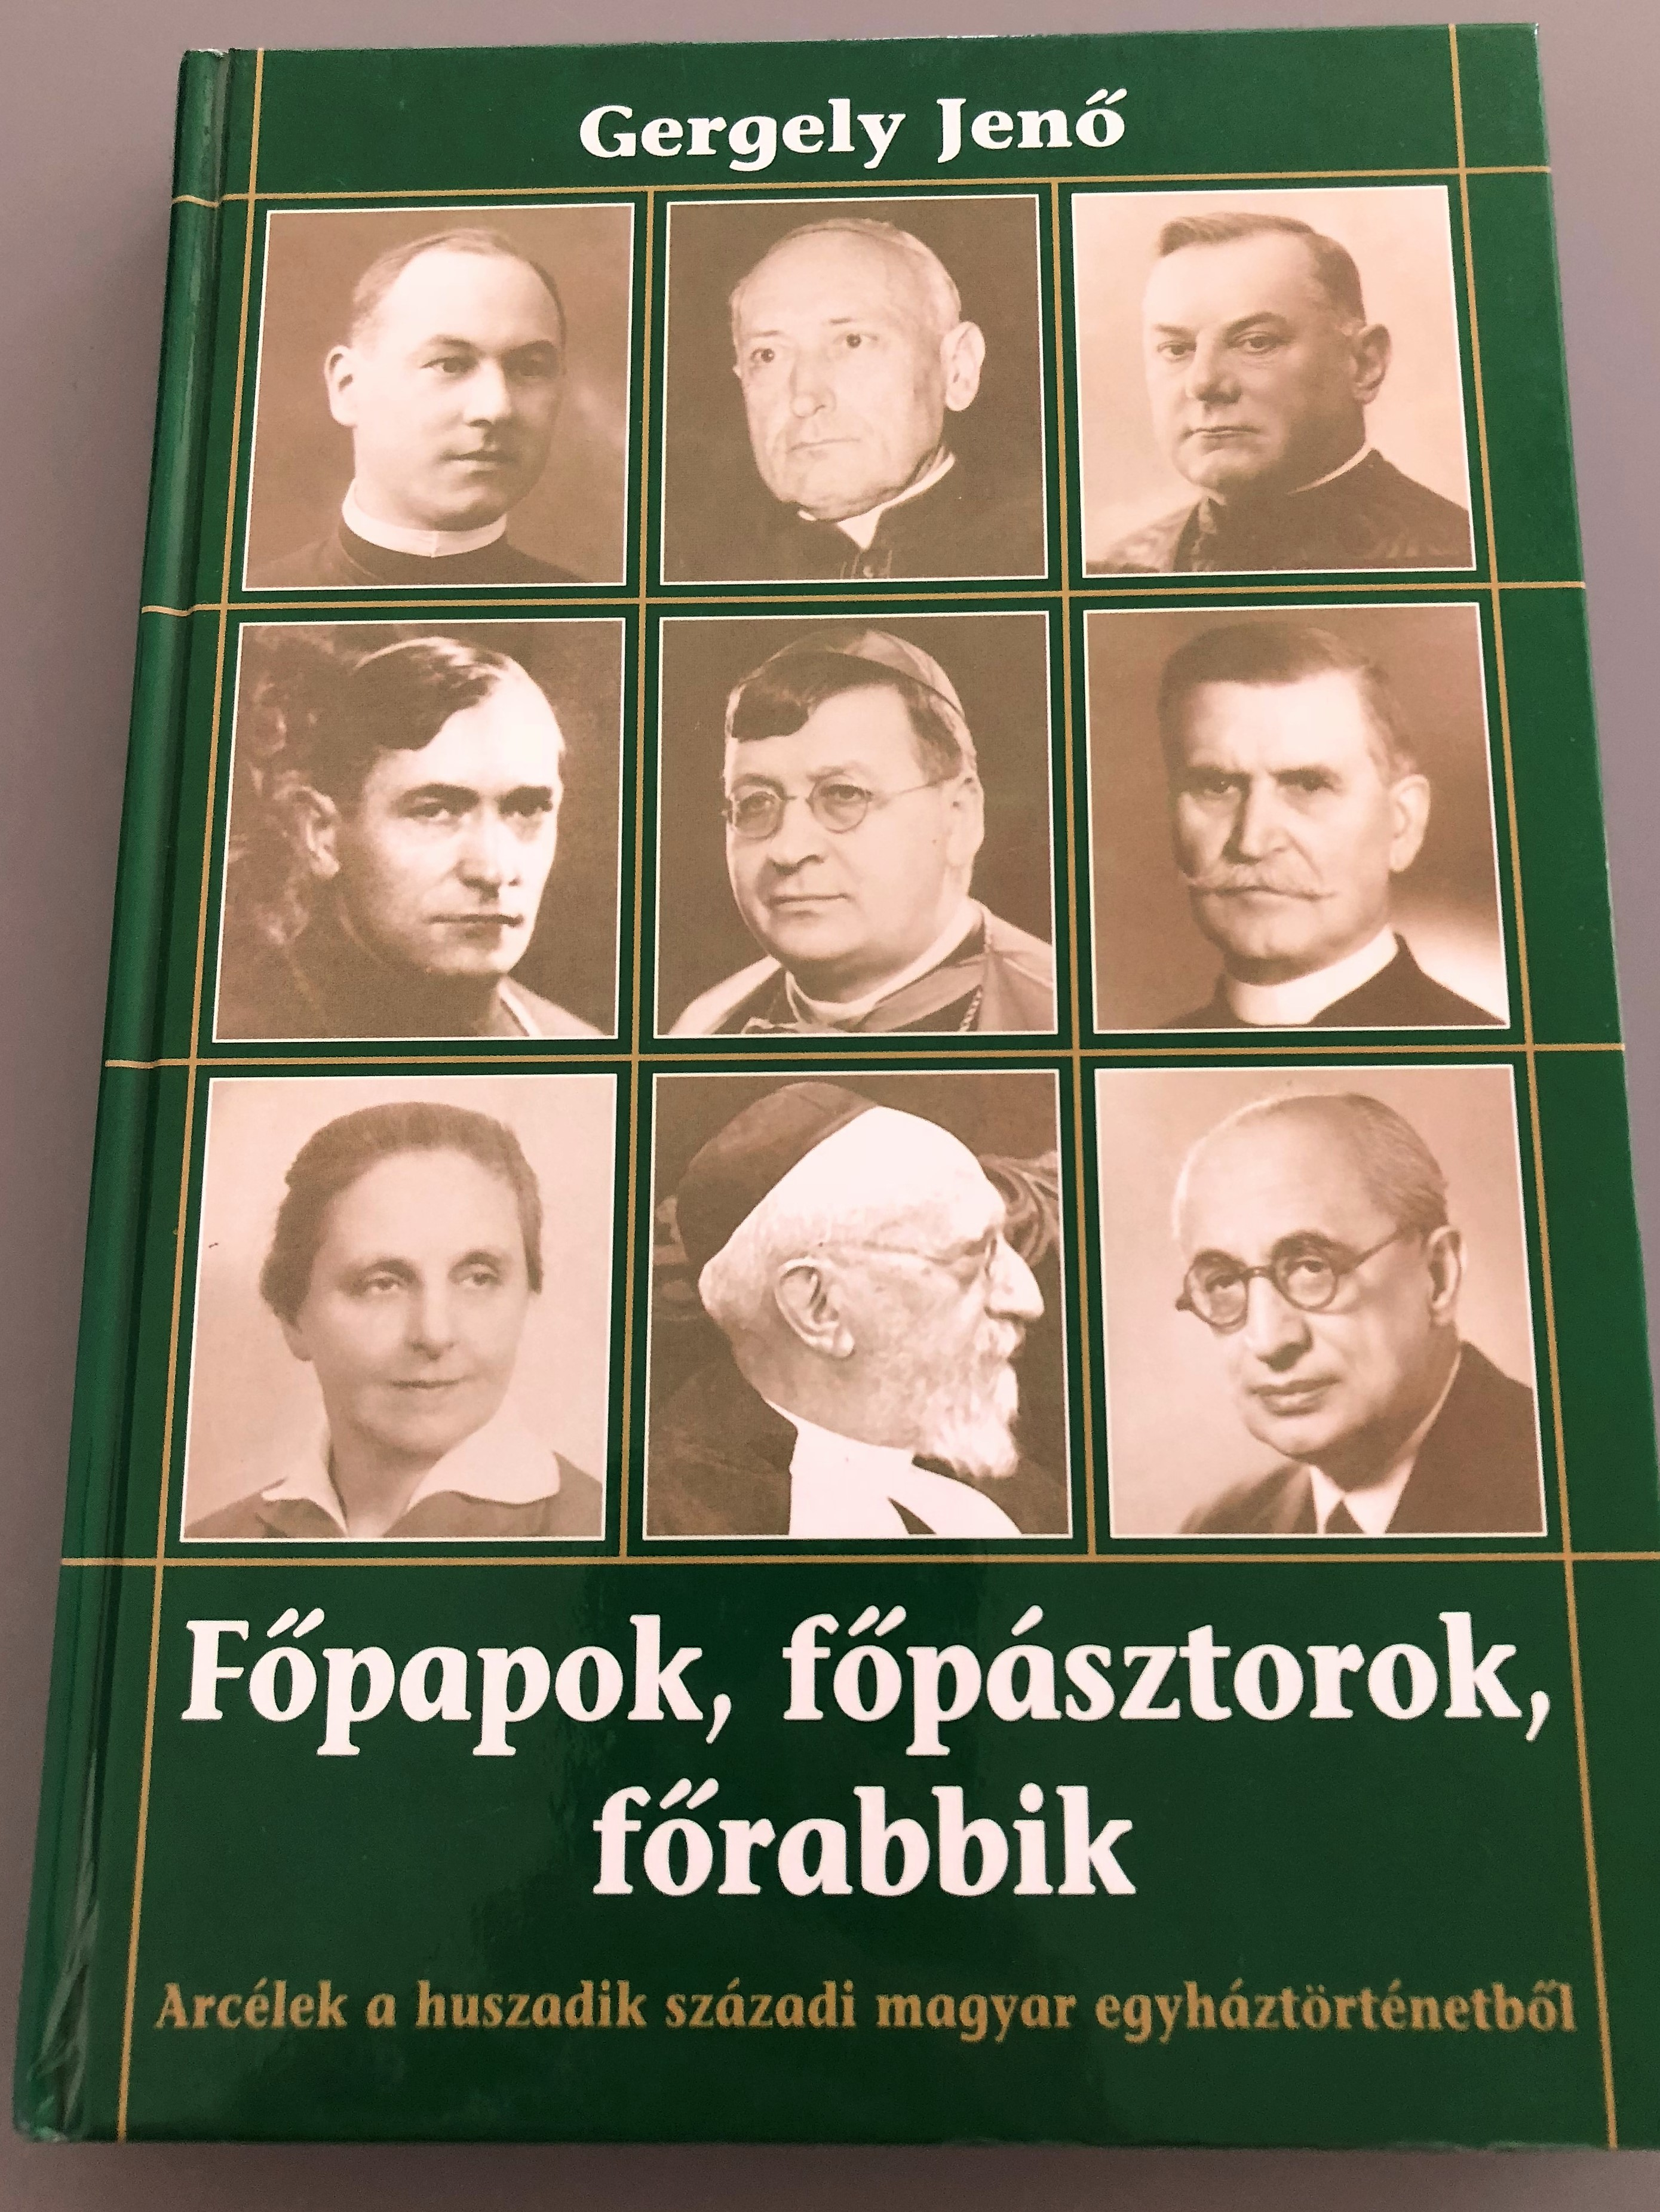 f-papok-f-p-sztorok-f-rabbik-by-gergely-jen-arc-lek-a-20.-sz-zadi-magyar-egyh-zt-rt-netb-l-priests-pastors-rabbis-20th-century-hungary-church-historical-figures-hardcover-pannonica-kiad-2004-1-.jpg